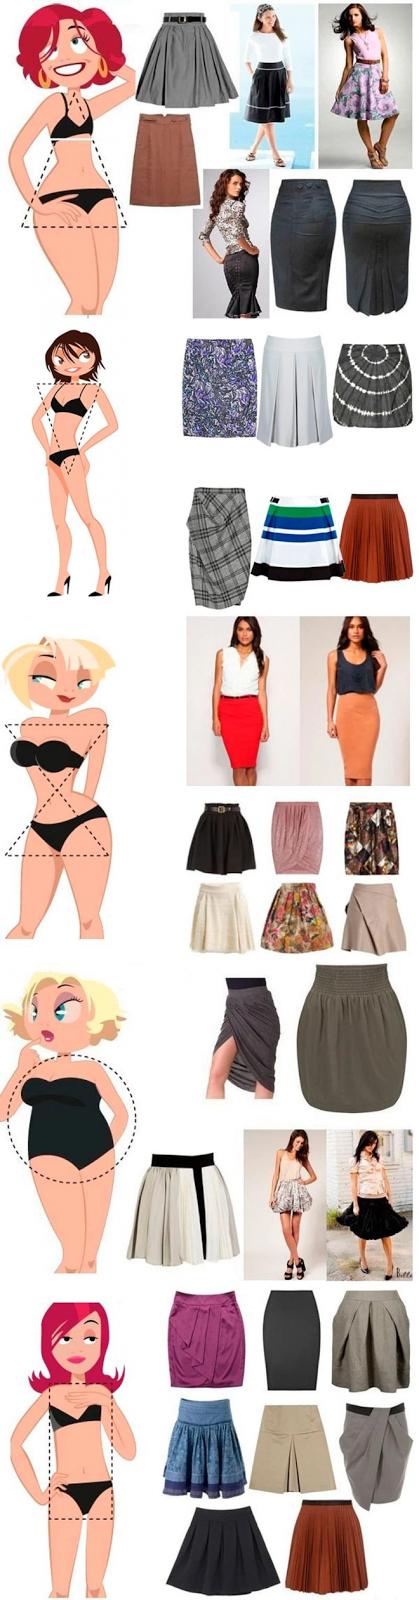 Como saber que falda te sienta mejor  segun tu figura